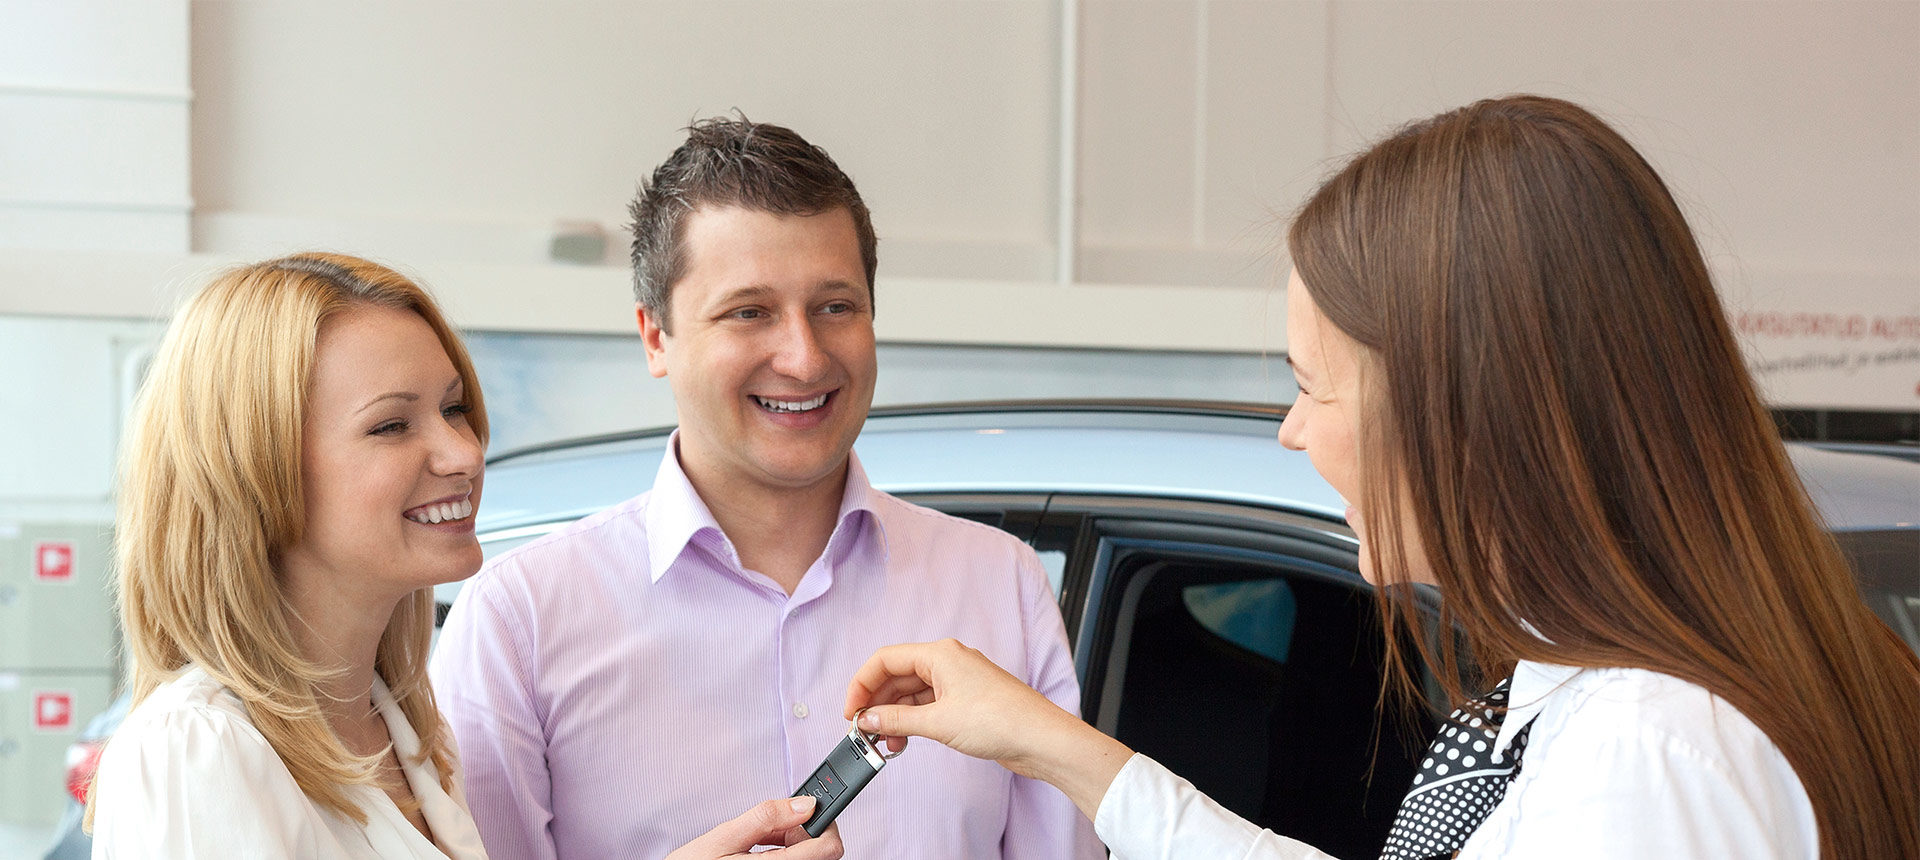 salesperson customers